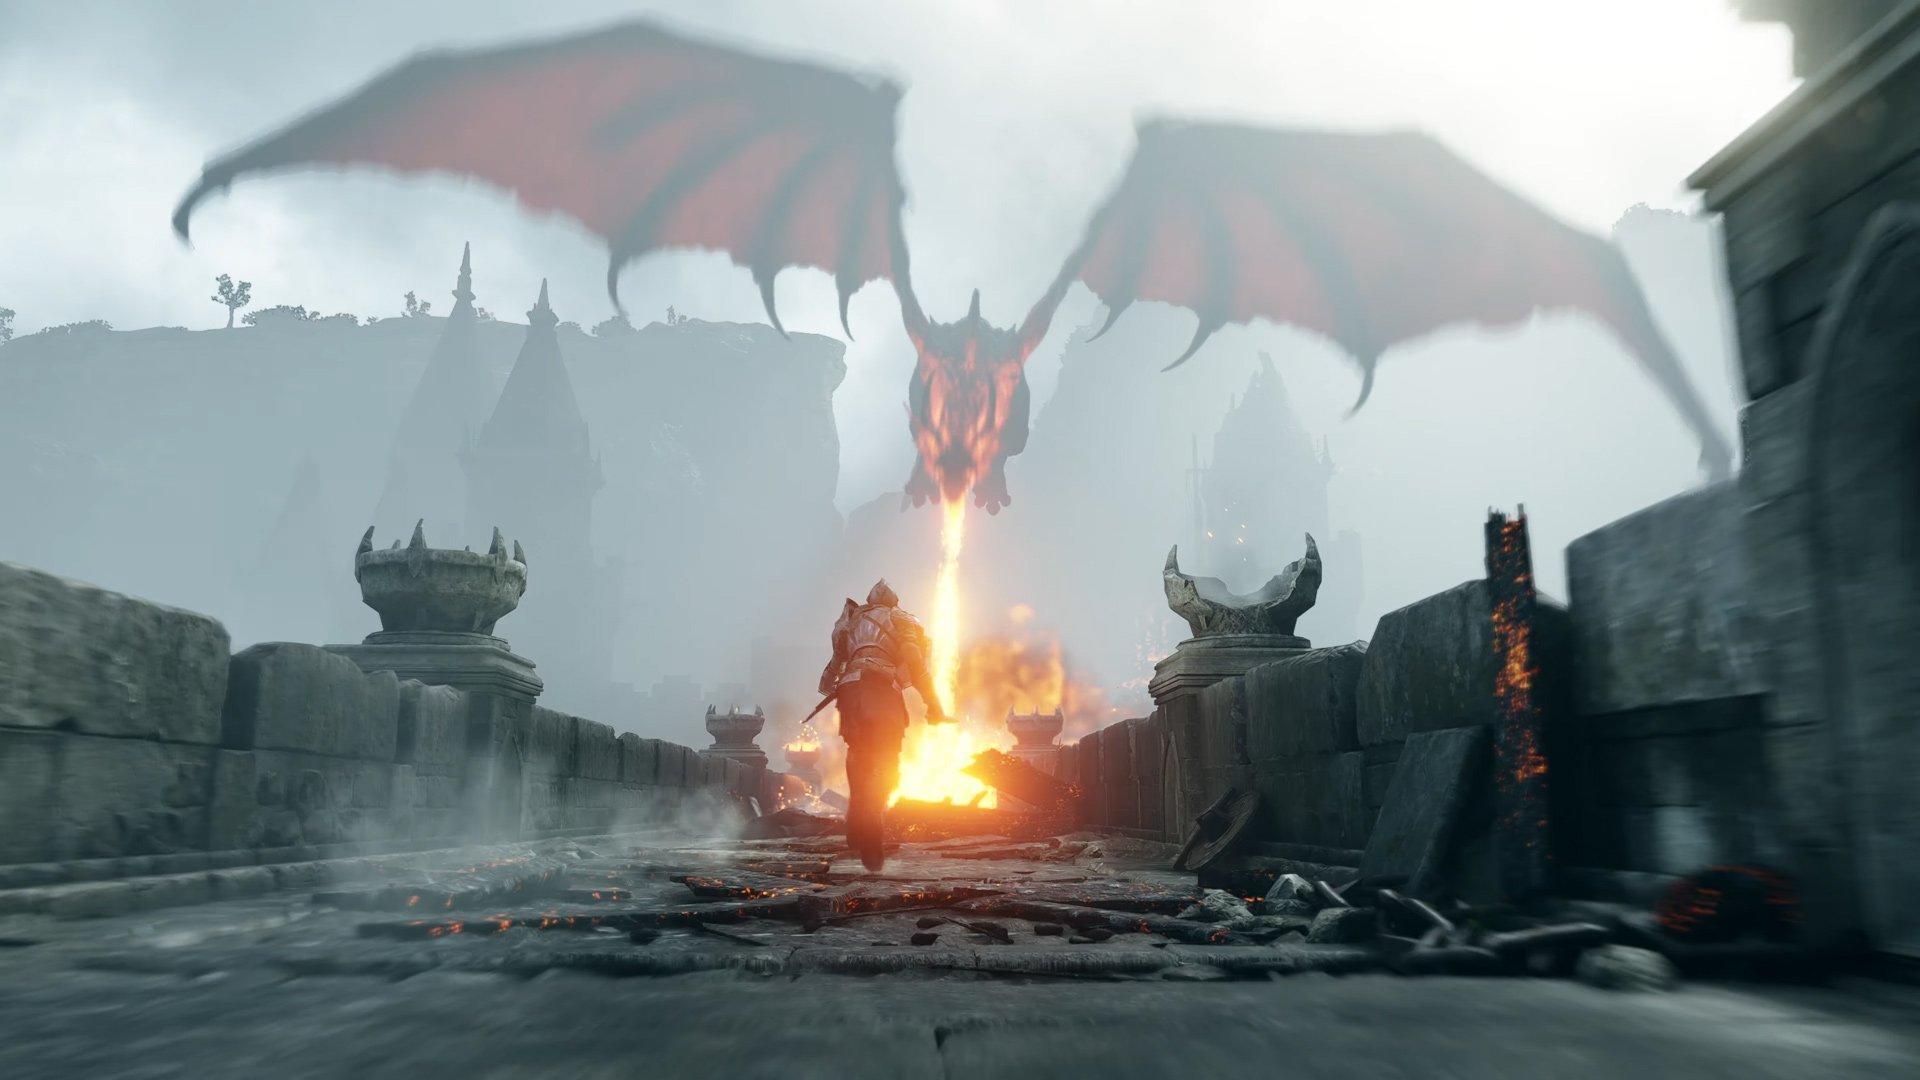 Demon's Souls Remake - PS5 - Wallpapers - 1920x1080